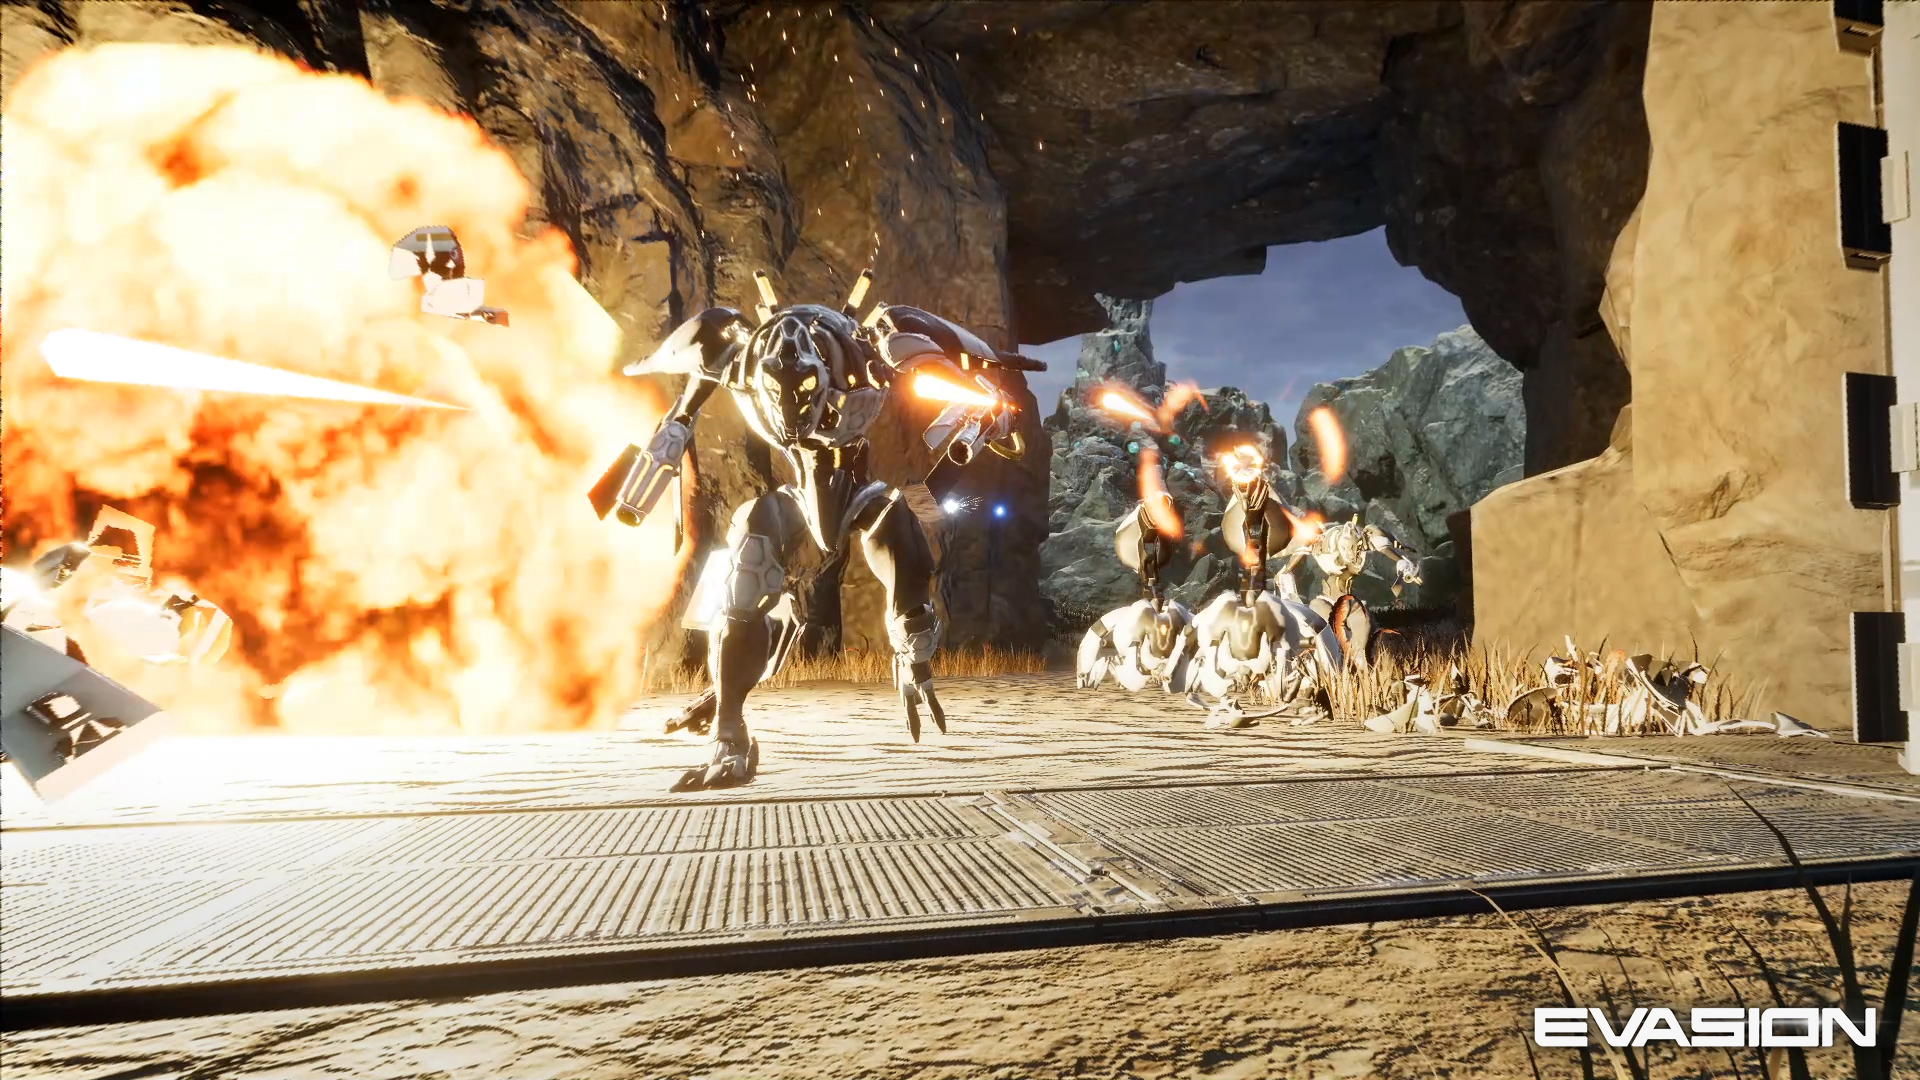 Evasion-Archiact-Oculus-Rift-HTC-Vive-VR-Shooter-SteamVR